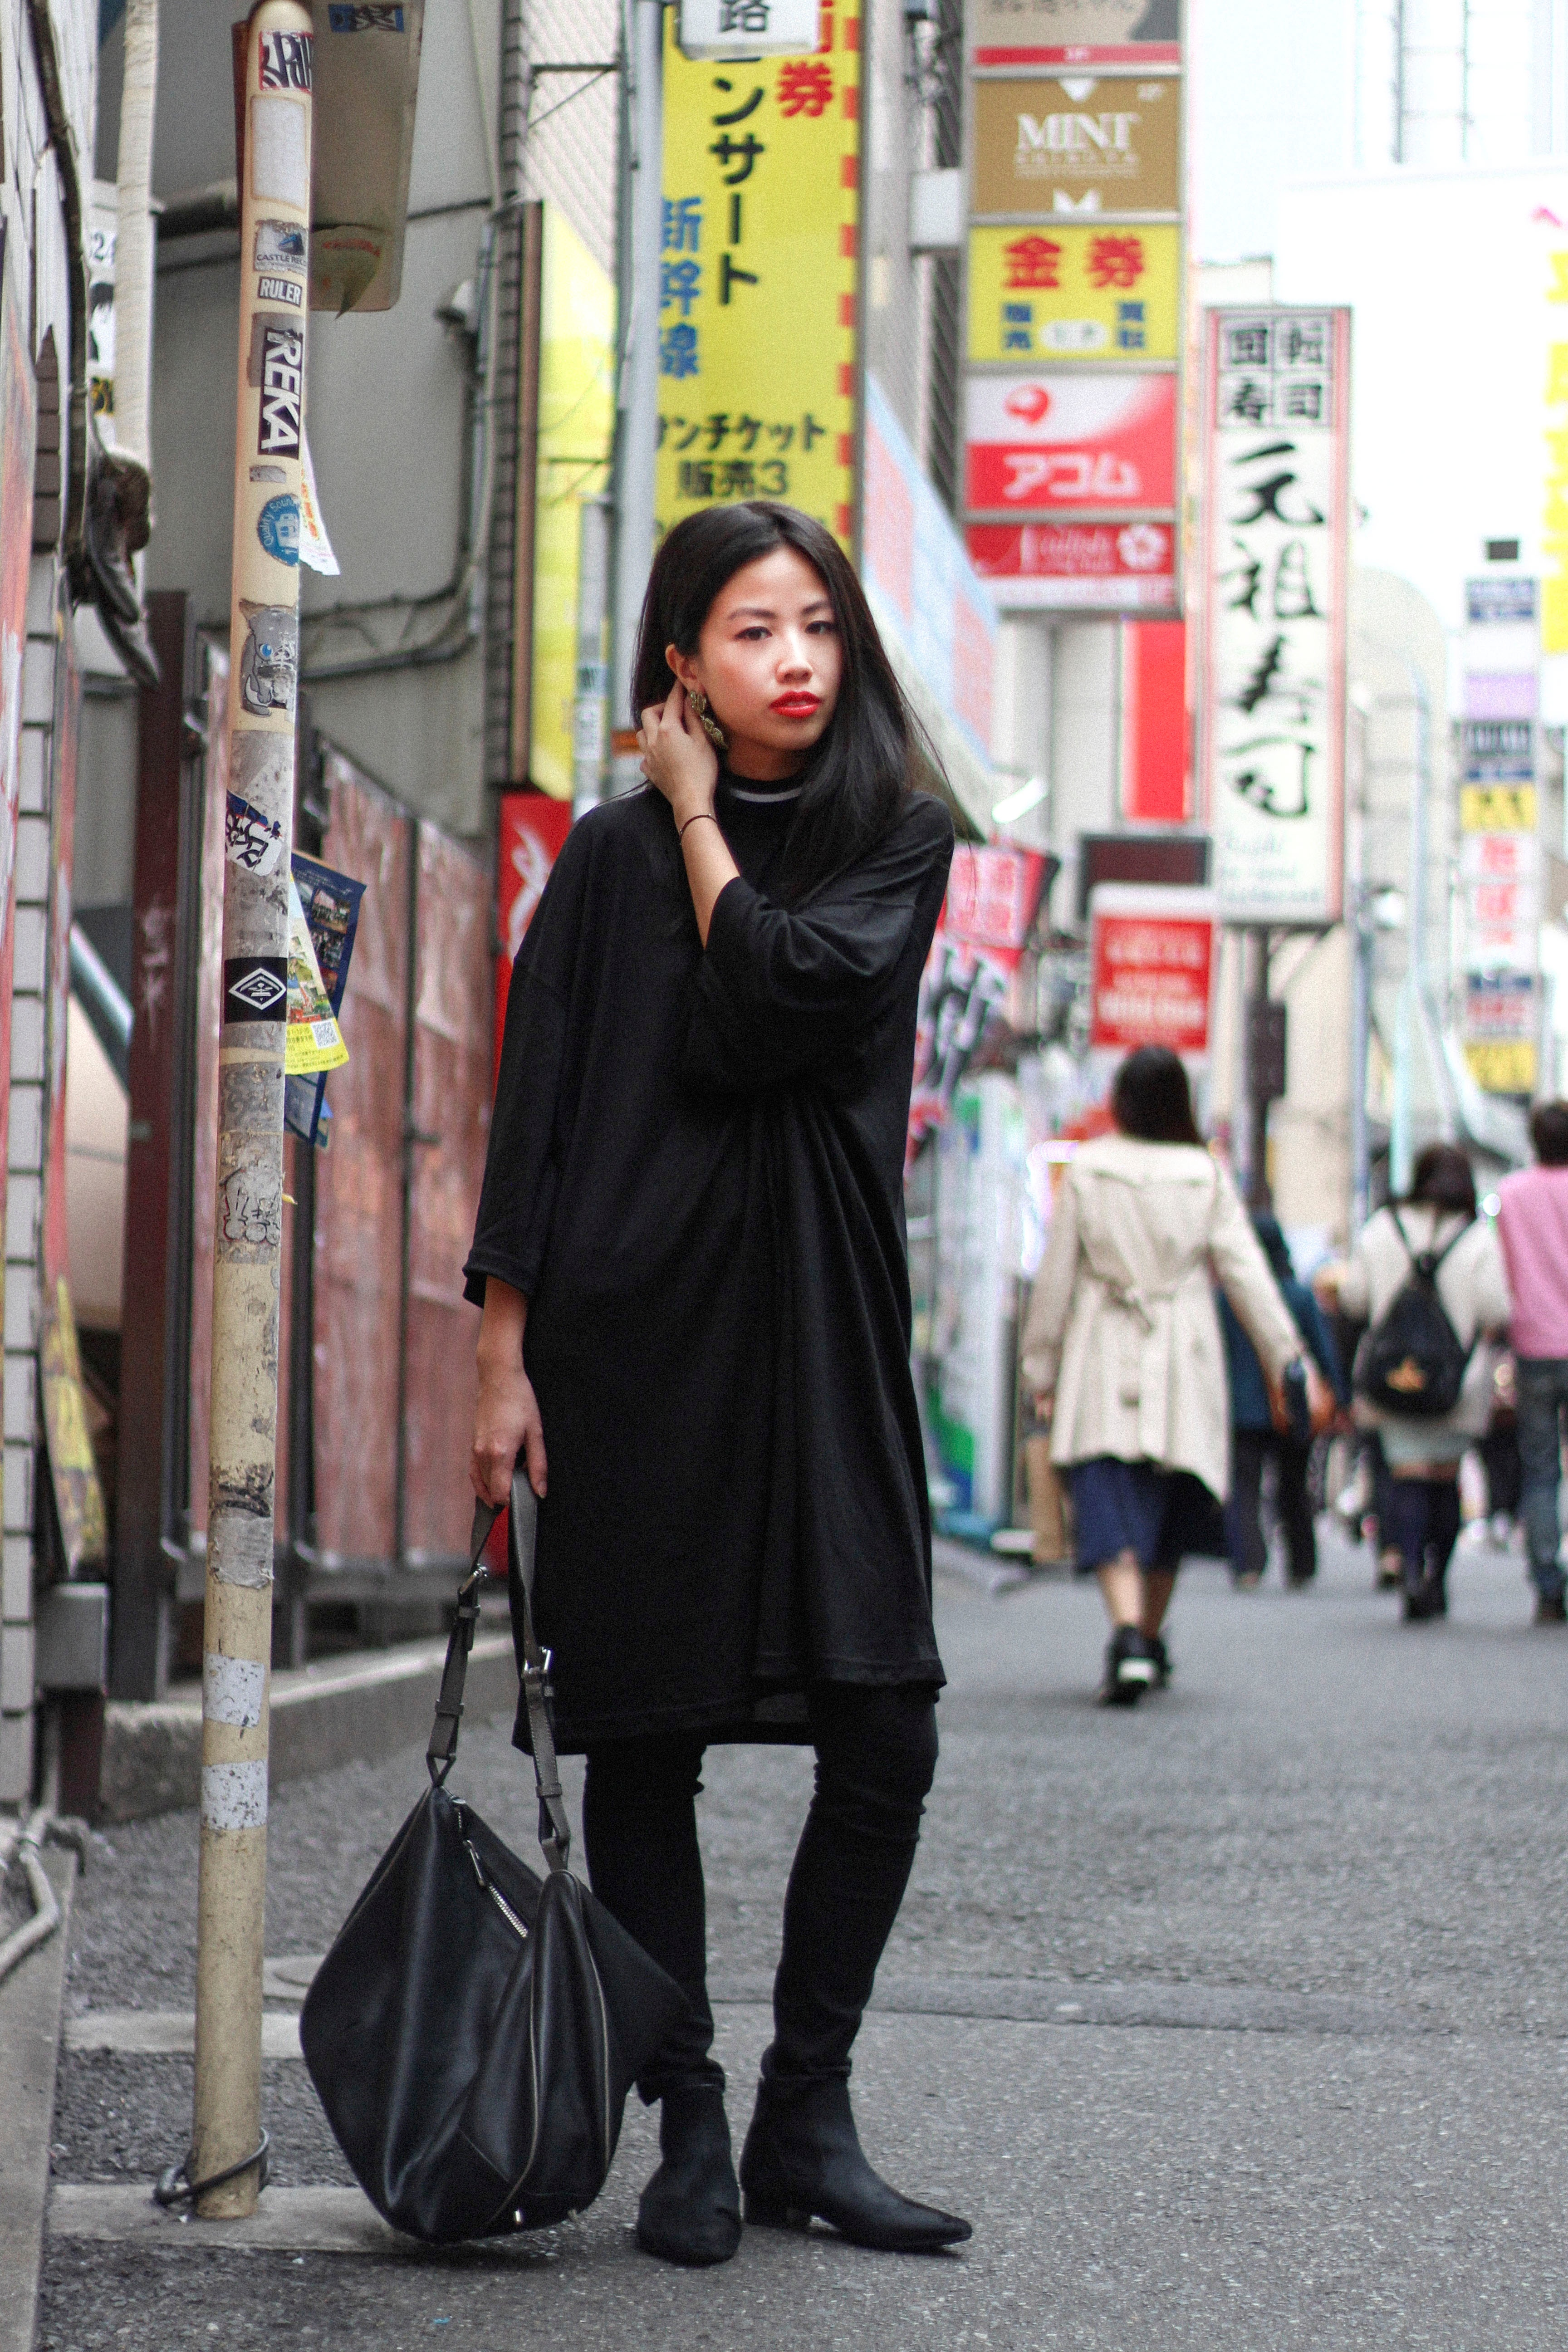 shibuya_tokyo_03